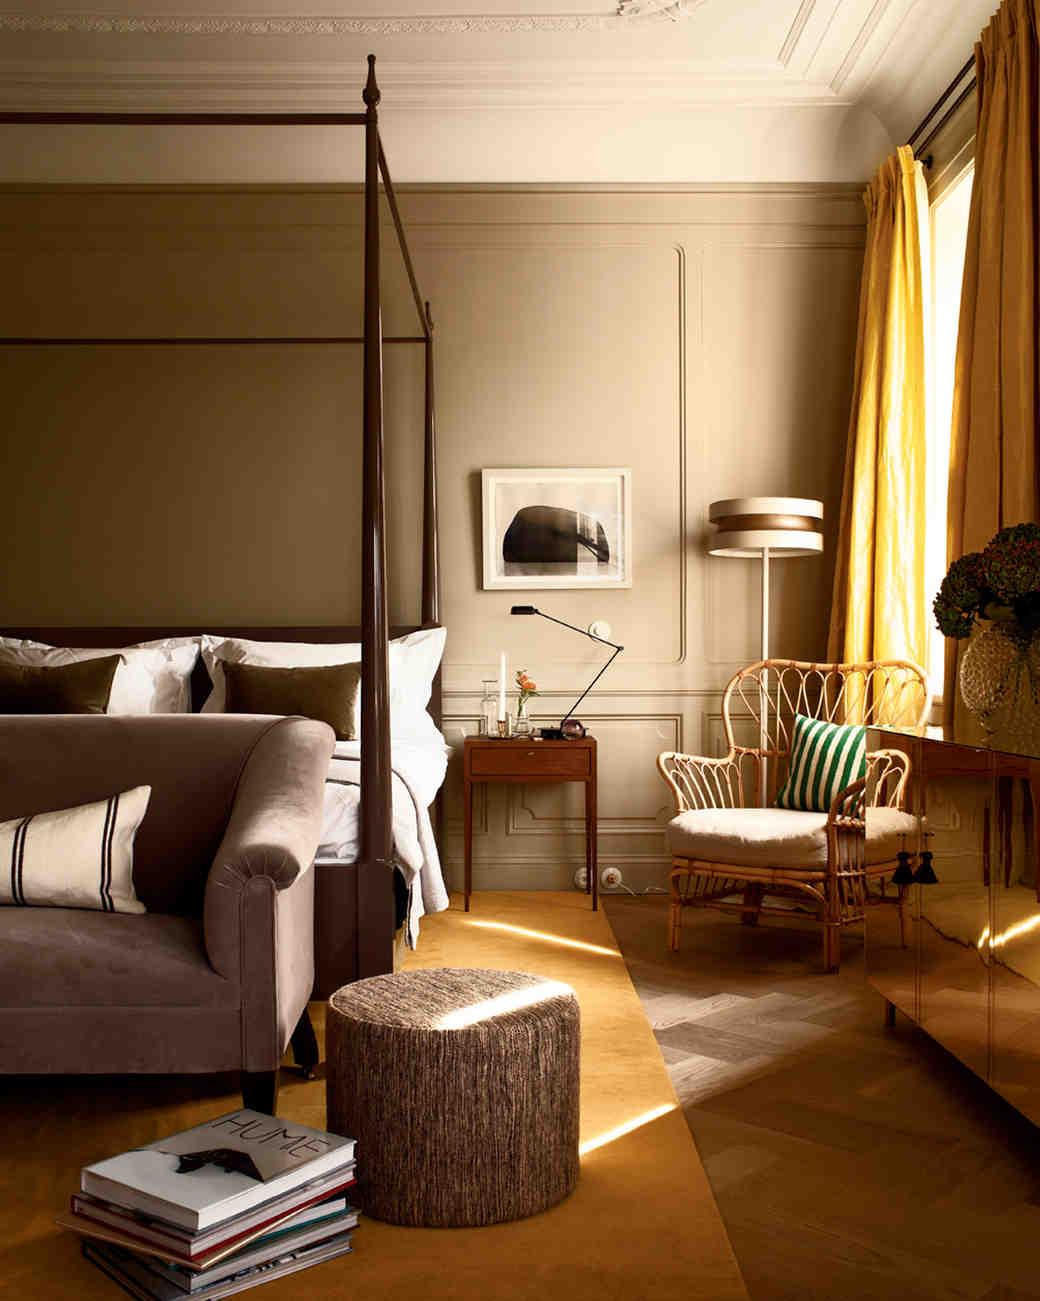 honeymoon-destinations-2015-sweden-ett-hem-0115.jpg